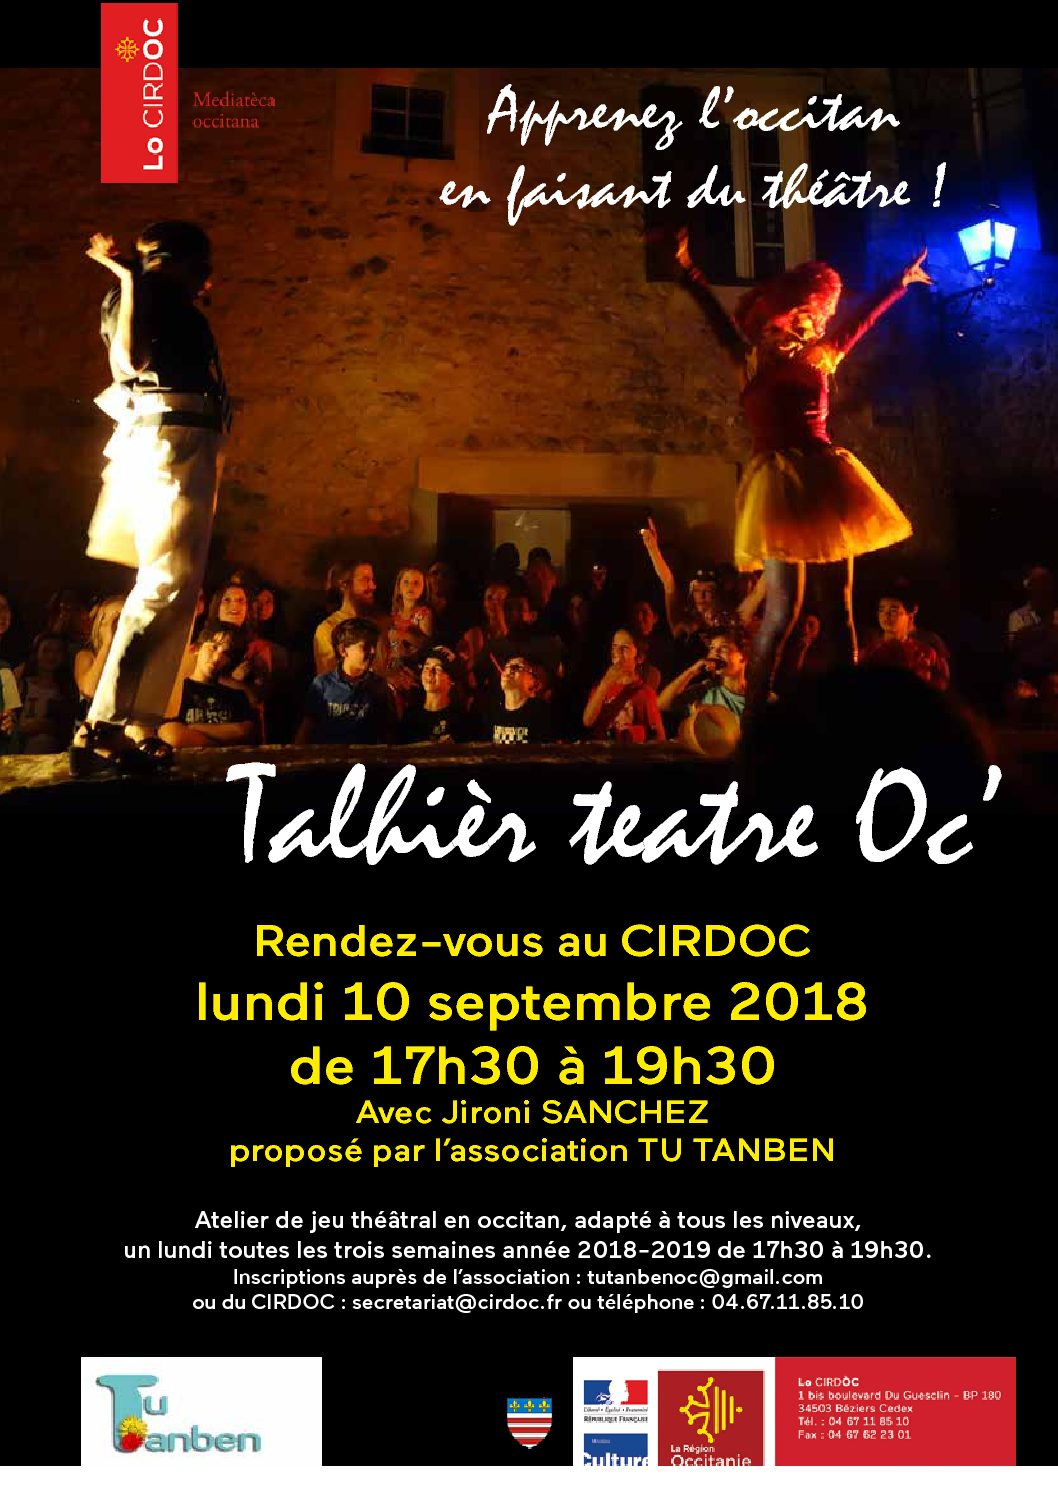 Talhièr teatre Oc' : apprenez l'occitan en faisant du théâtre !